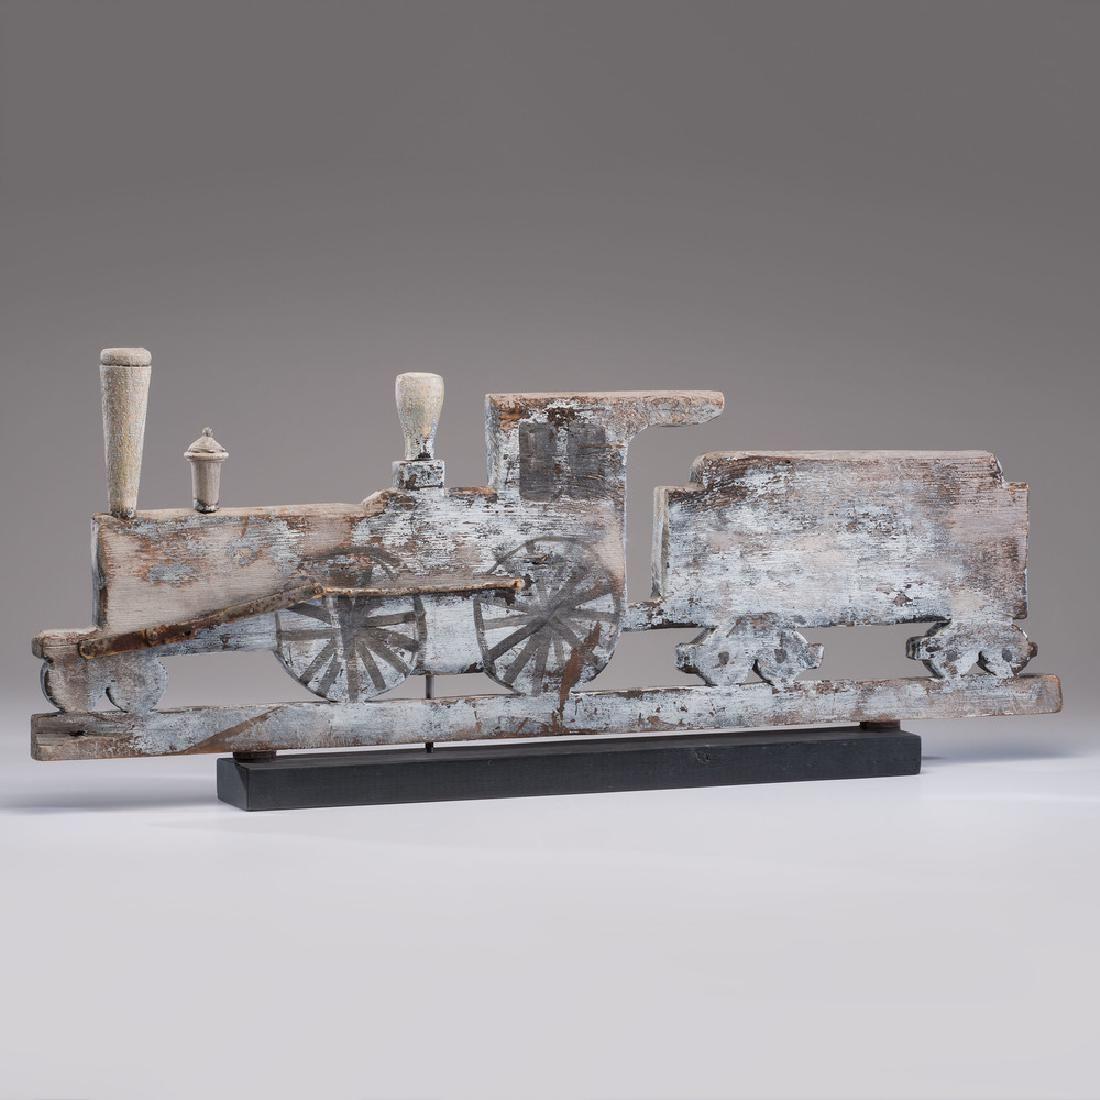 Wooden Locomotive Weathervane from New England